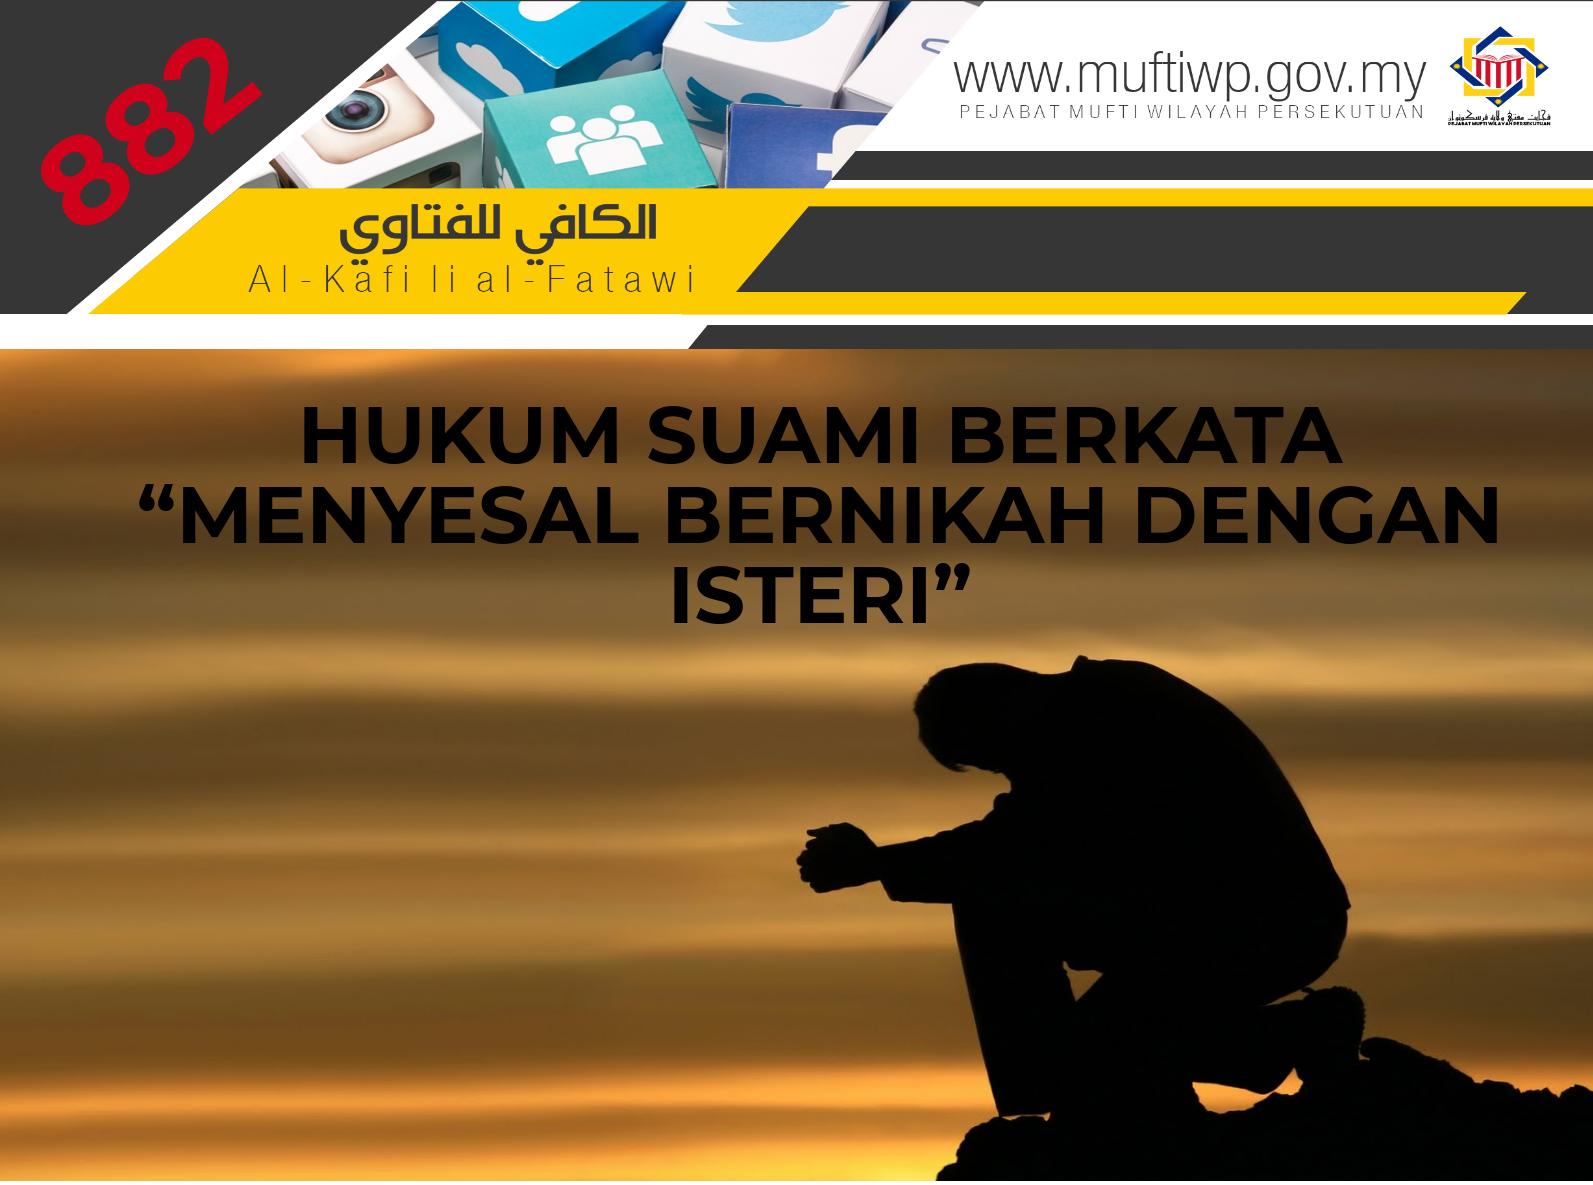 Pejabat Mufti Wilayah Persekutuan - AL KAFI   884  HUKUM SUAMI ... 7bd332409f